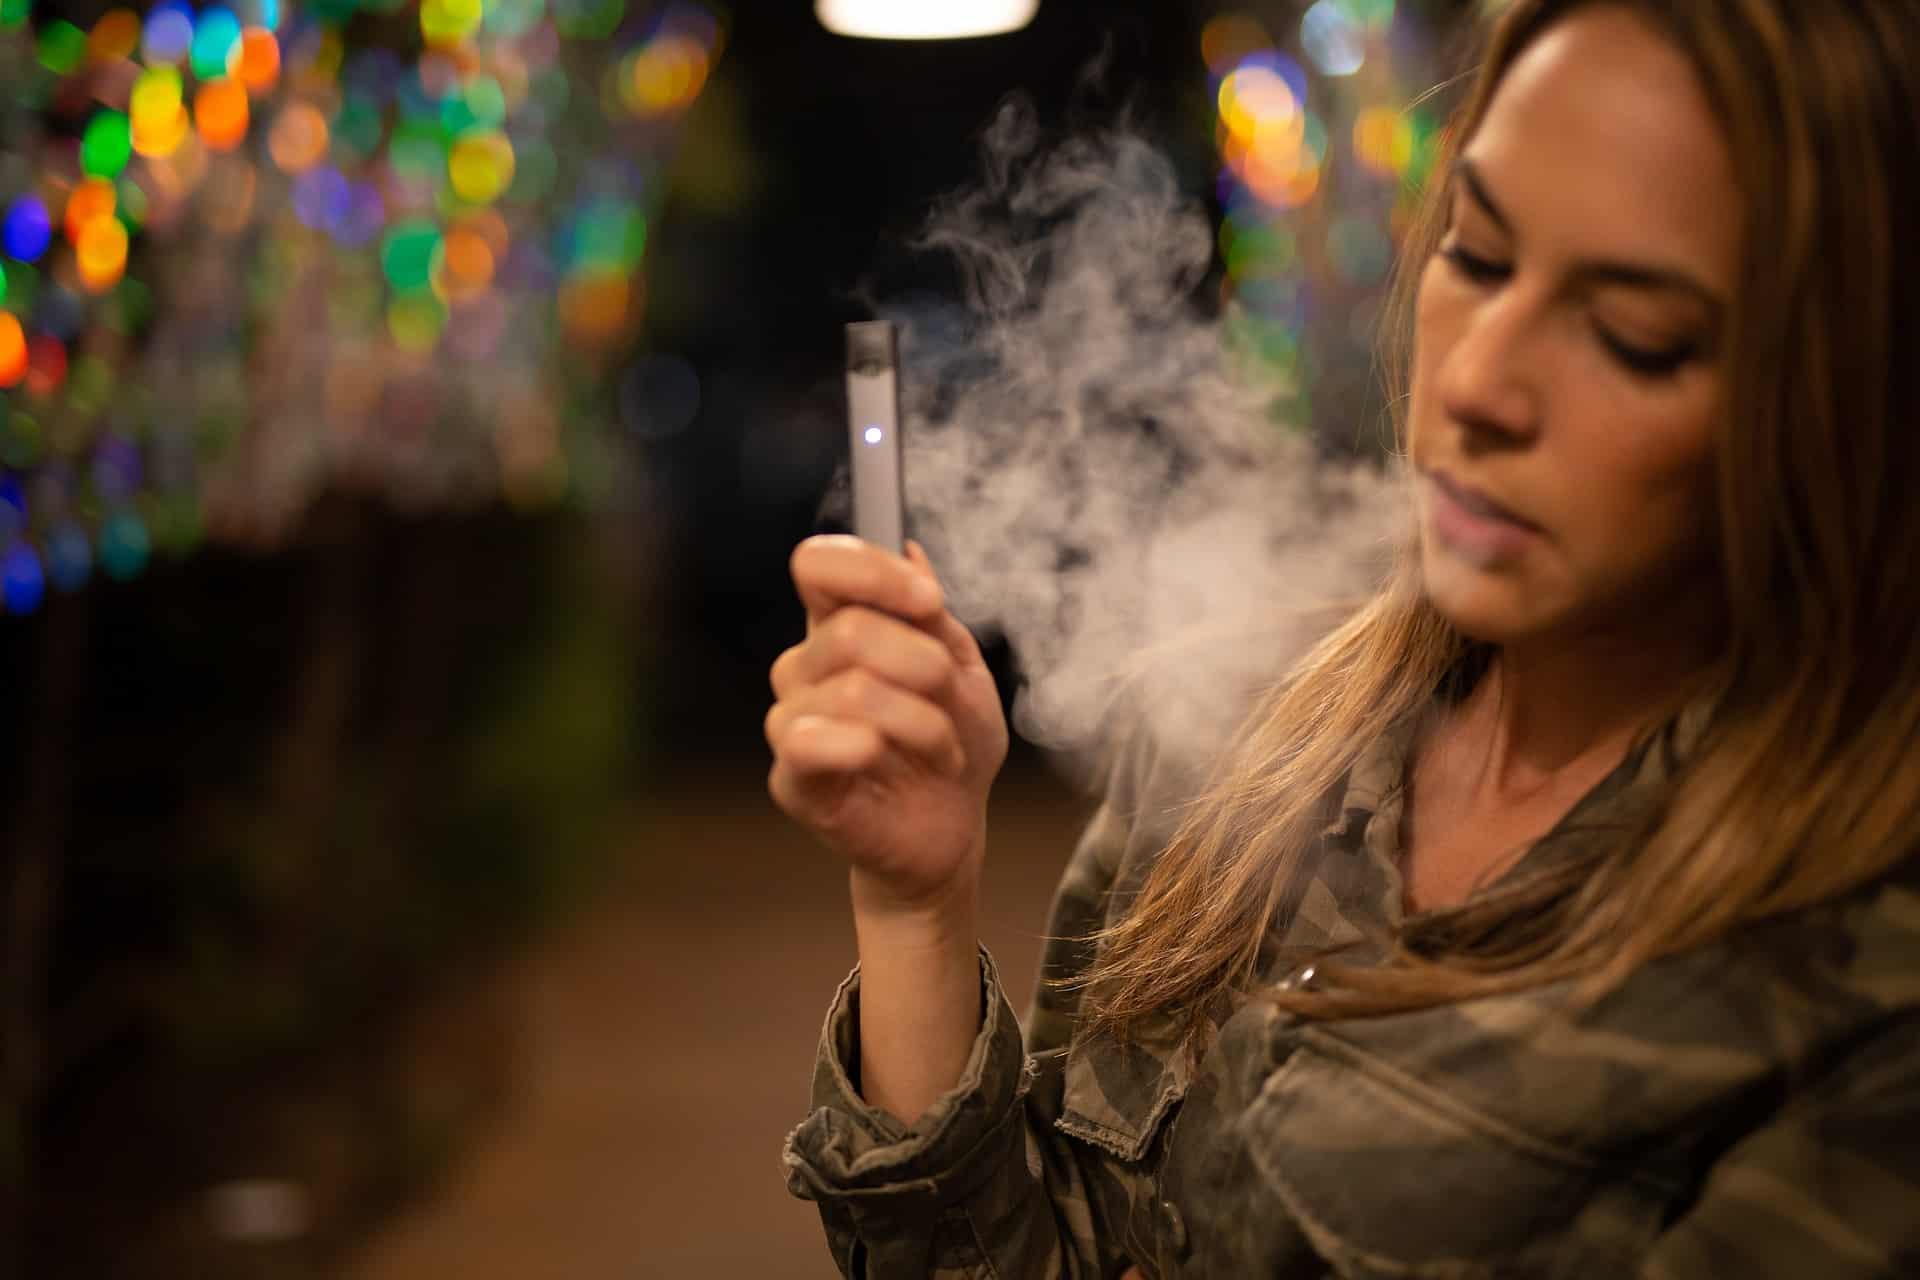 Mädchen mit E Zigarette